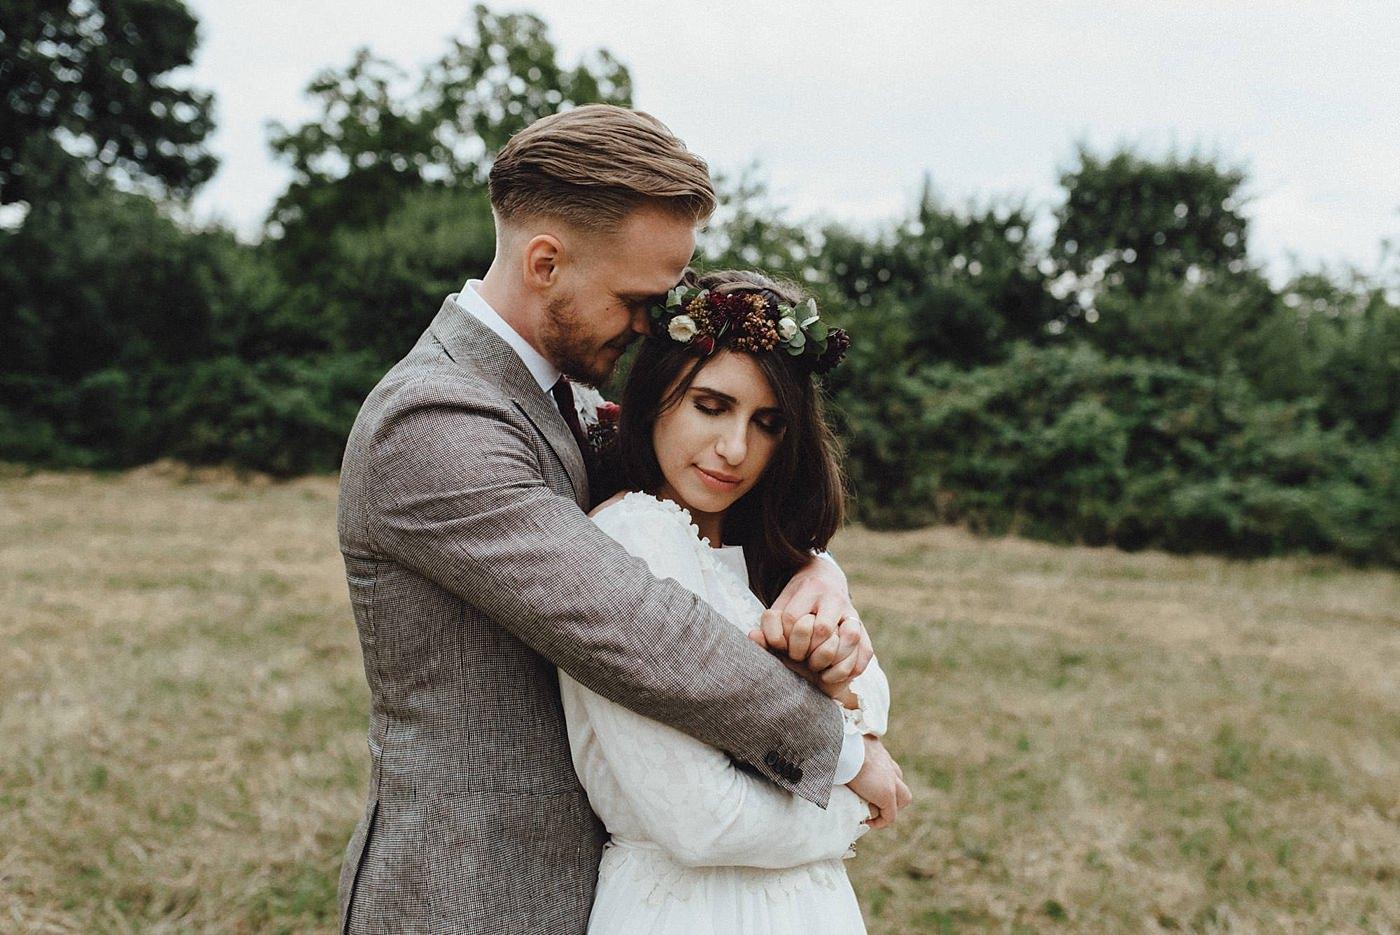 urban-elopement-wedding-222